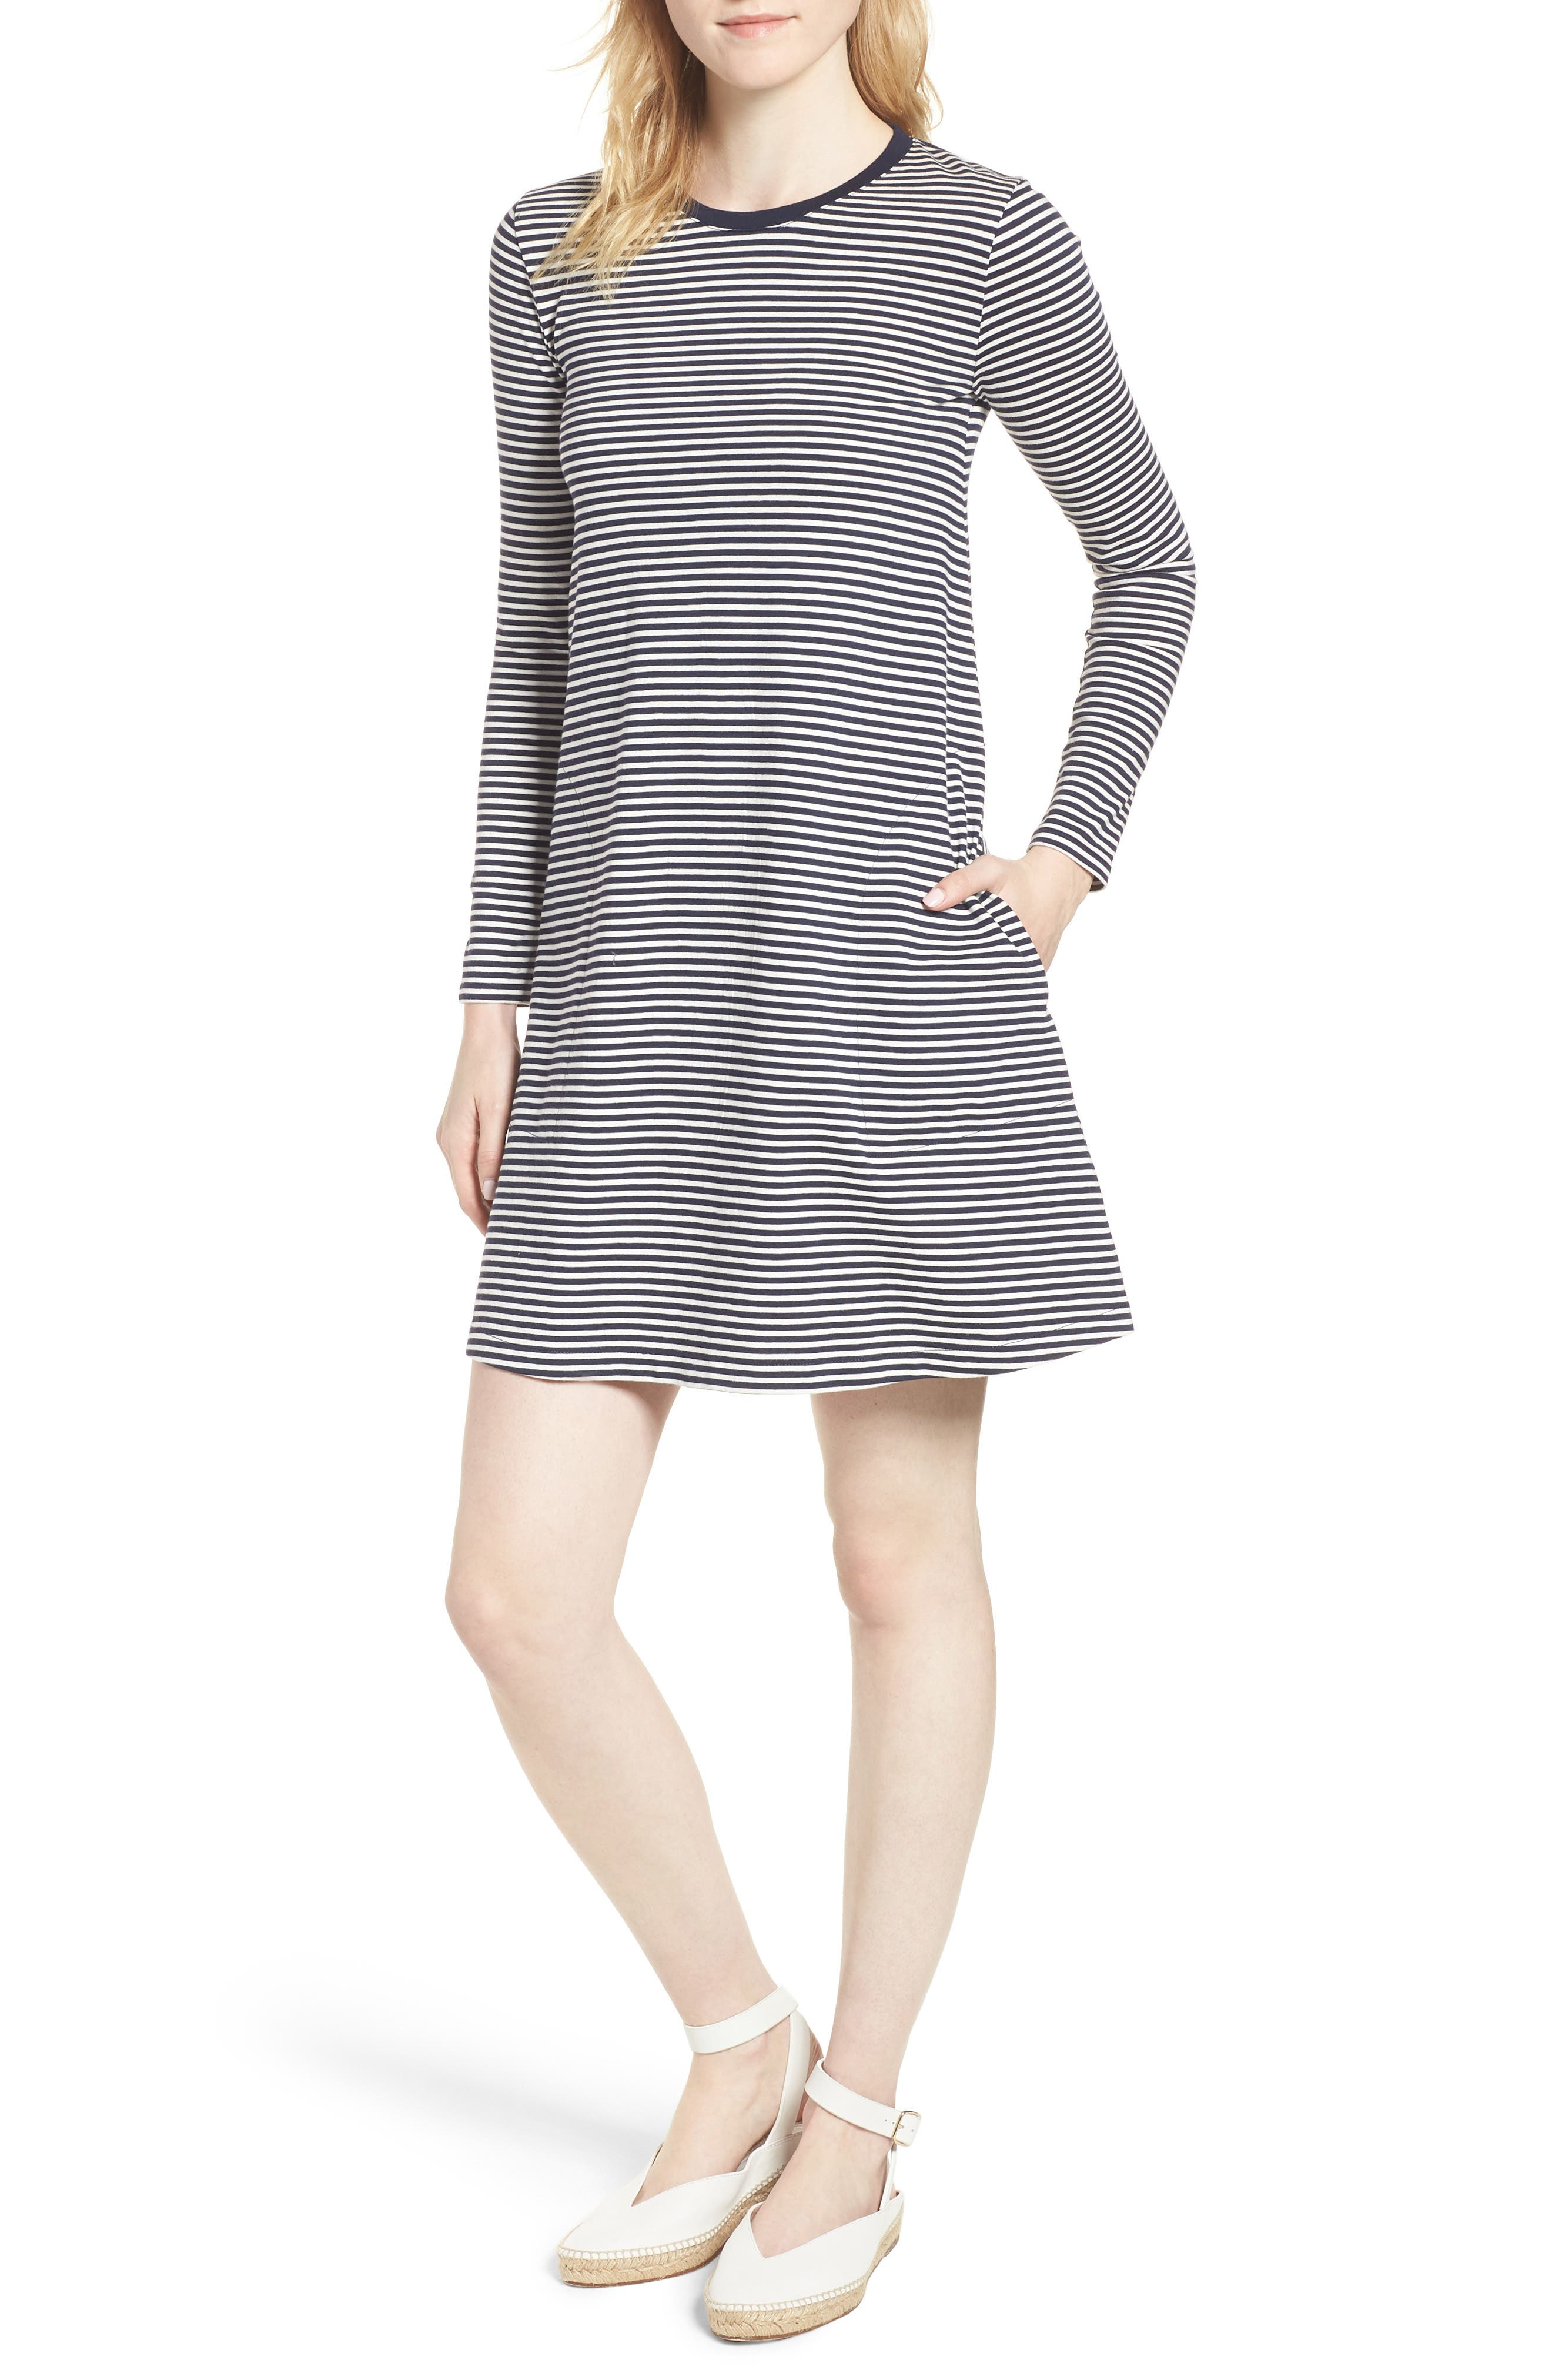 J.Crew Easy Pocket Cotton Knit Stripe Dress